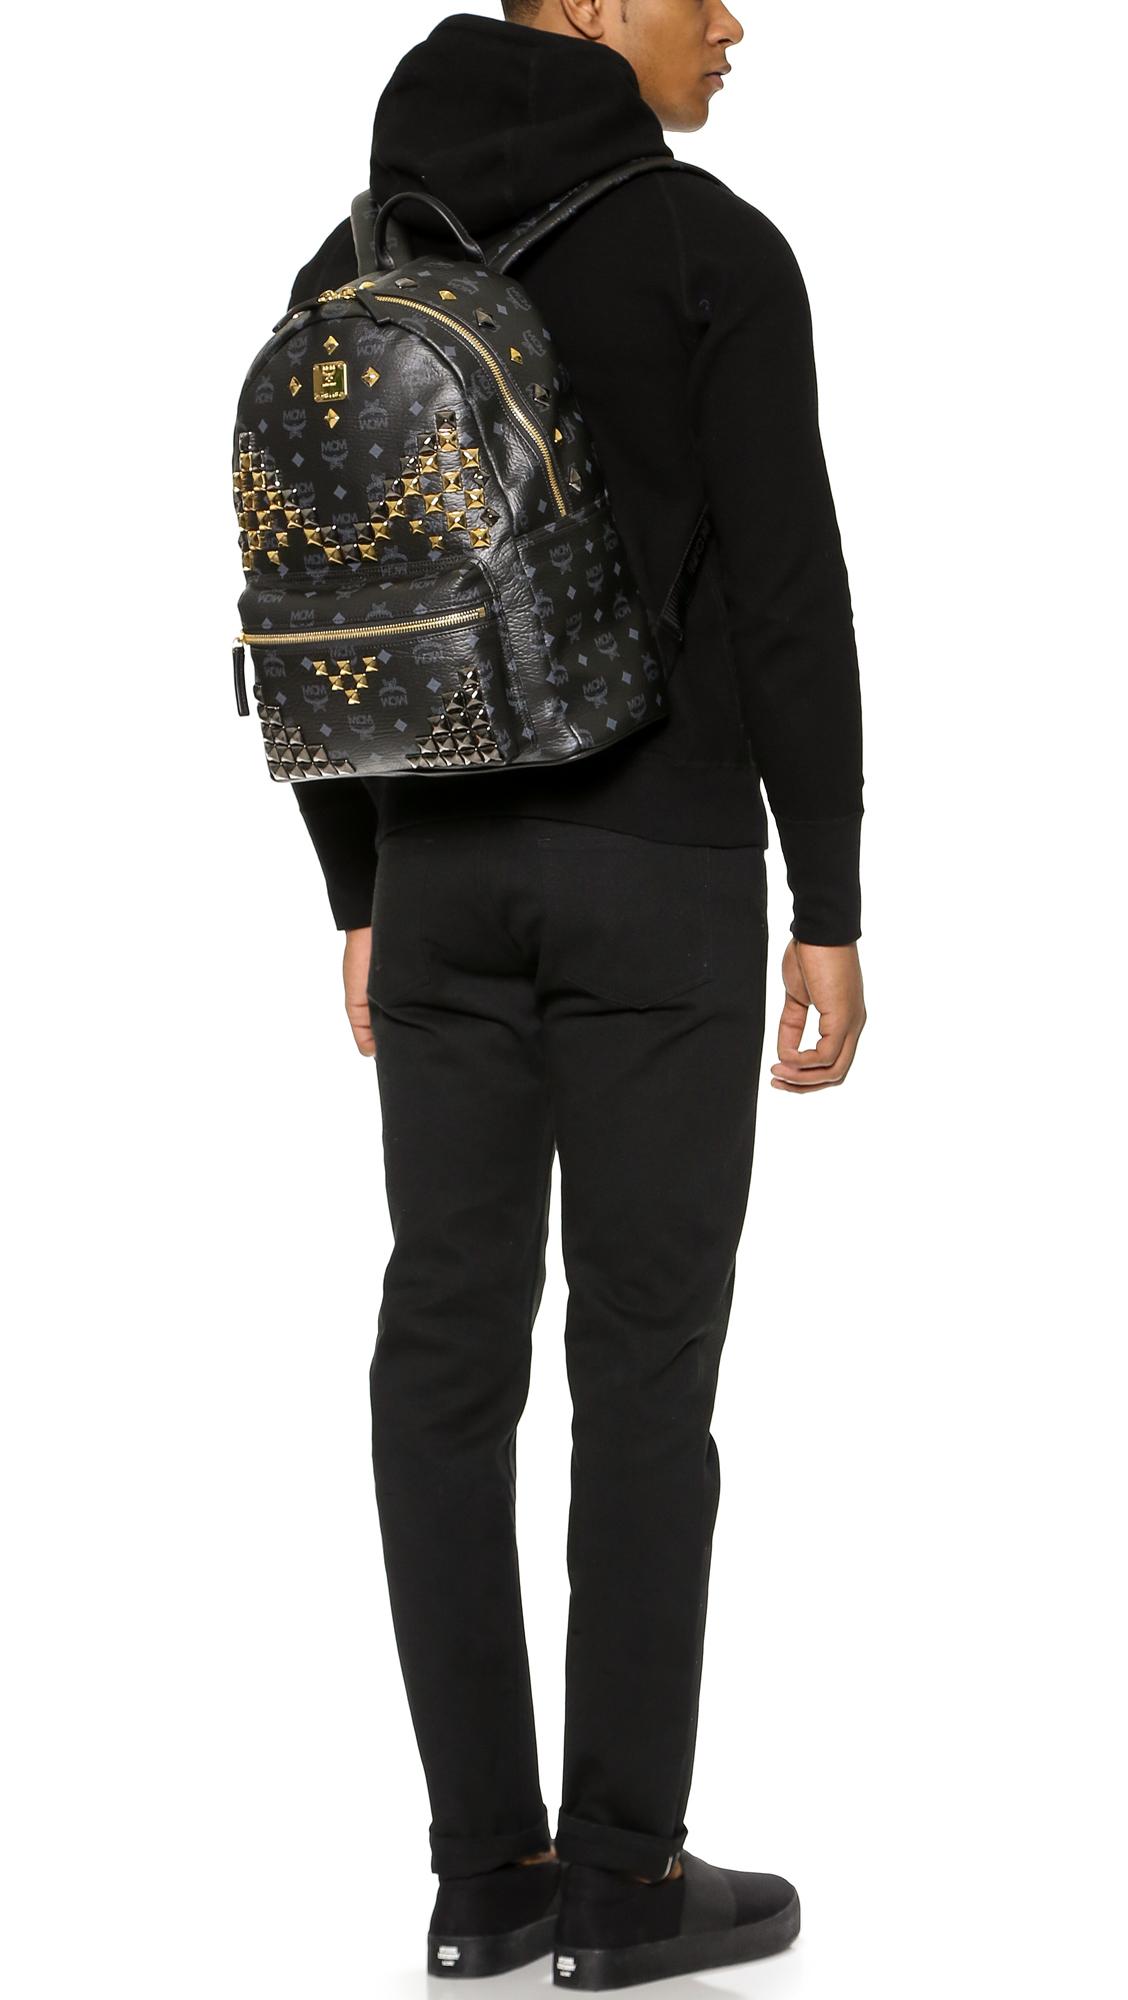 f1441a55b57 MCM M Studded Stark Backpack in Black for Men - Lyst